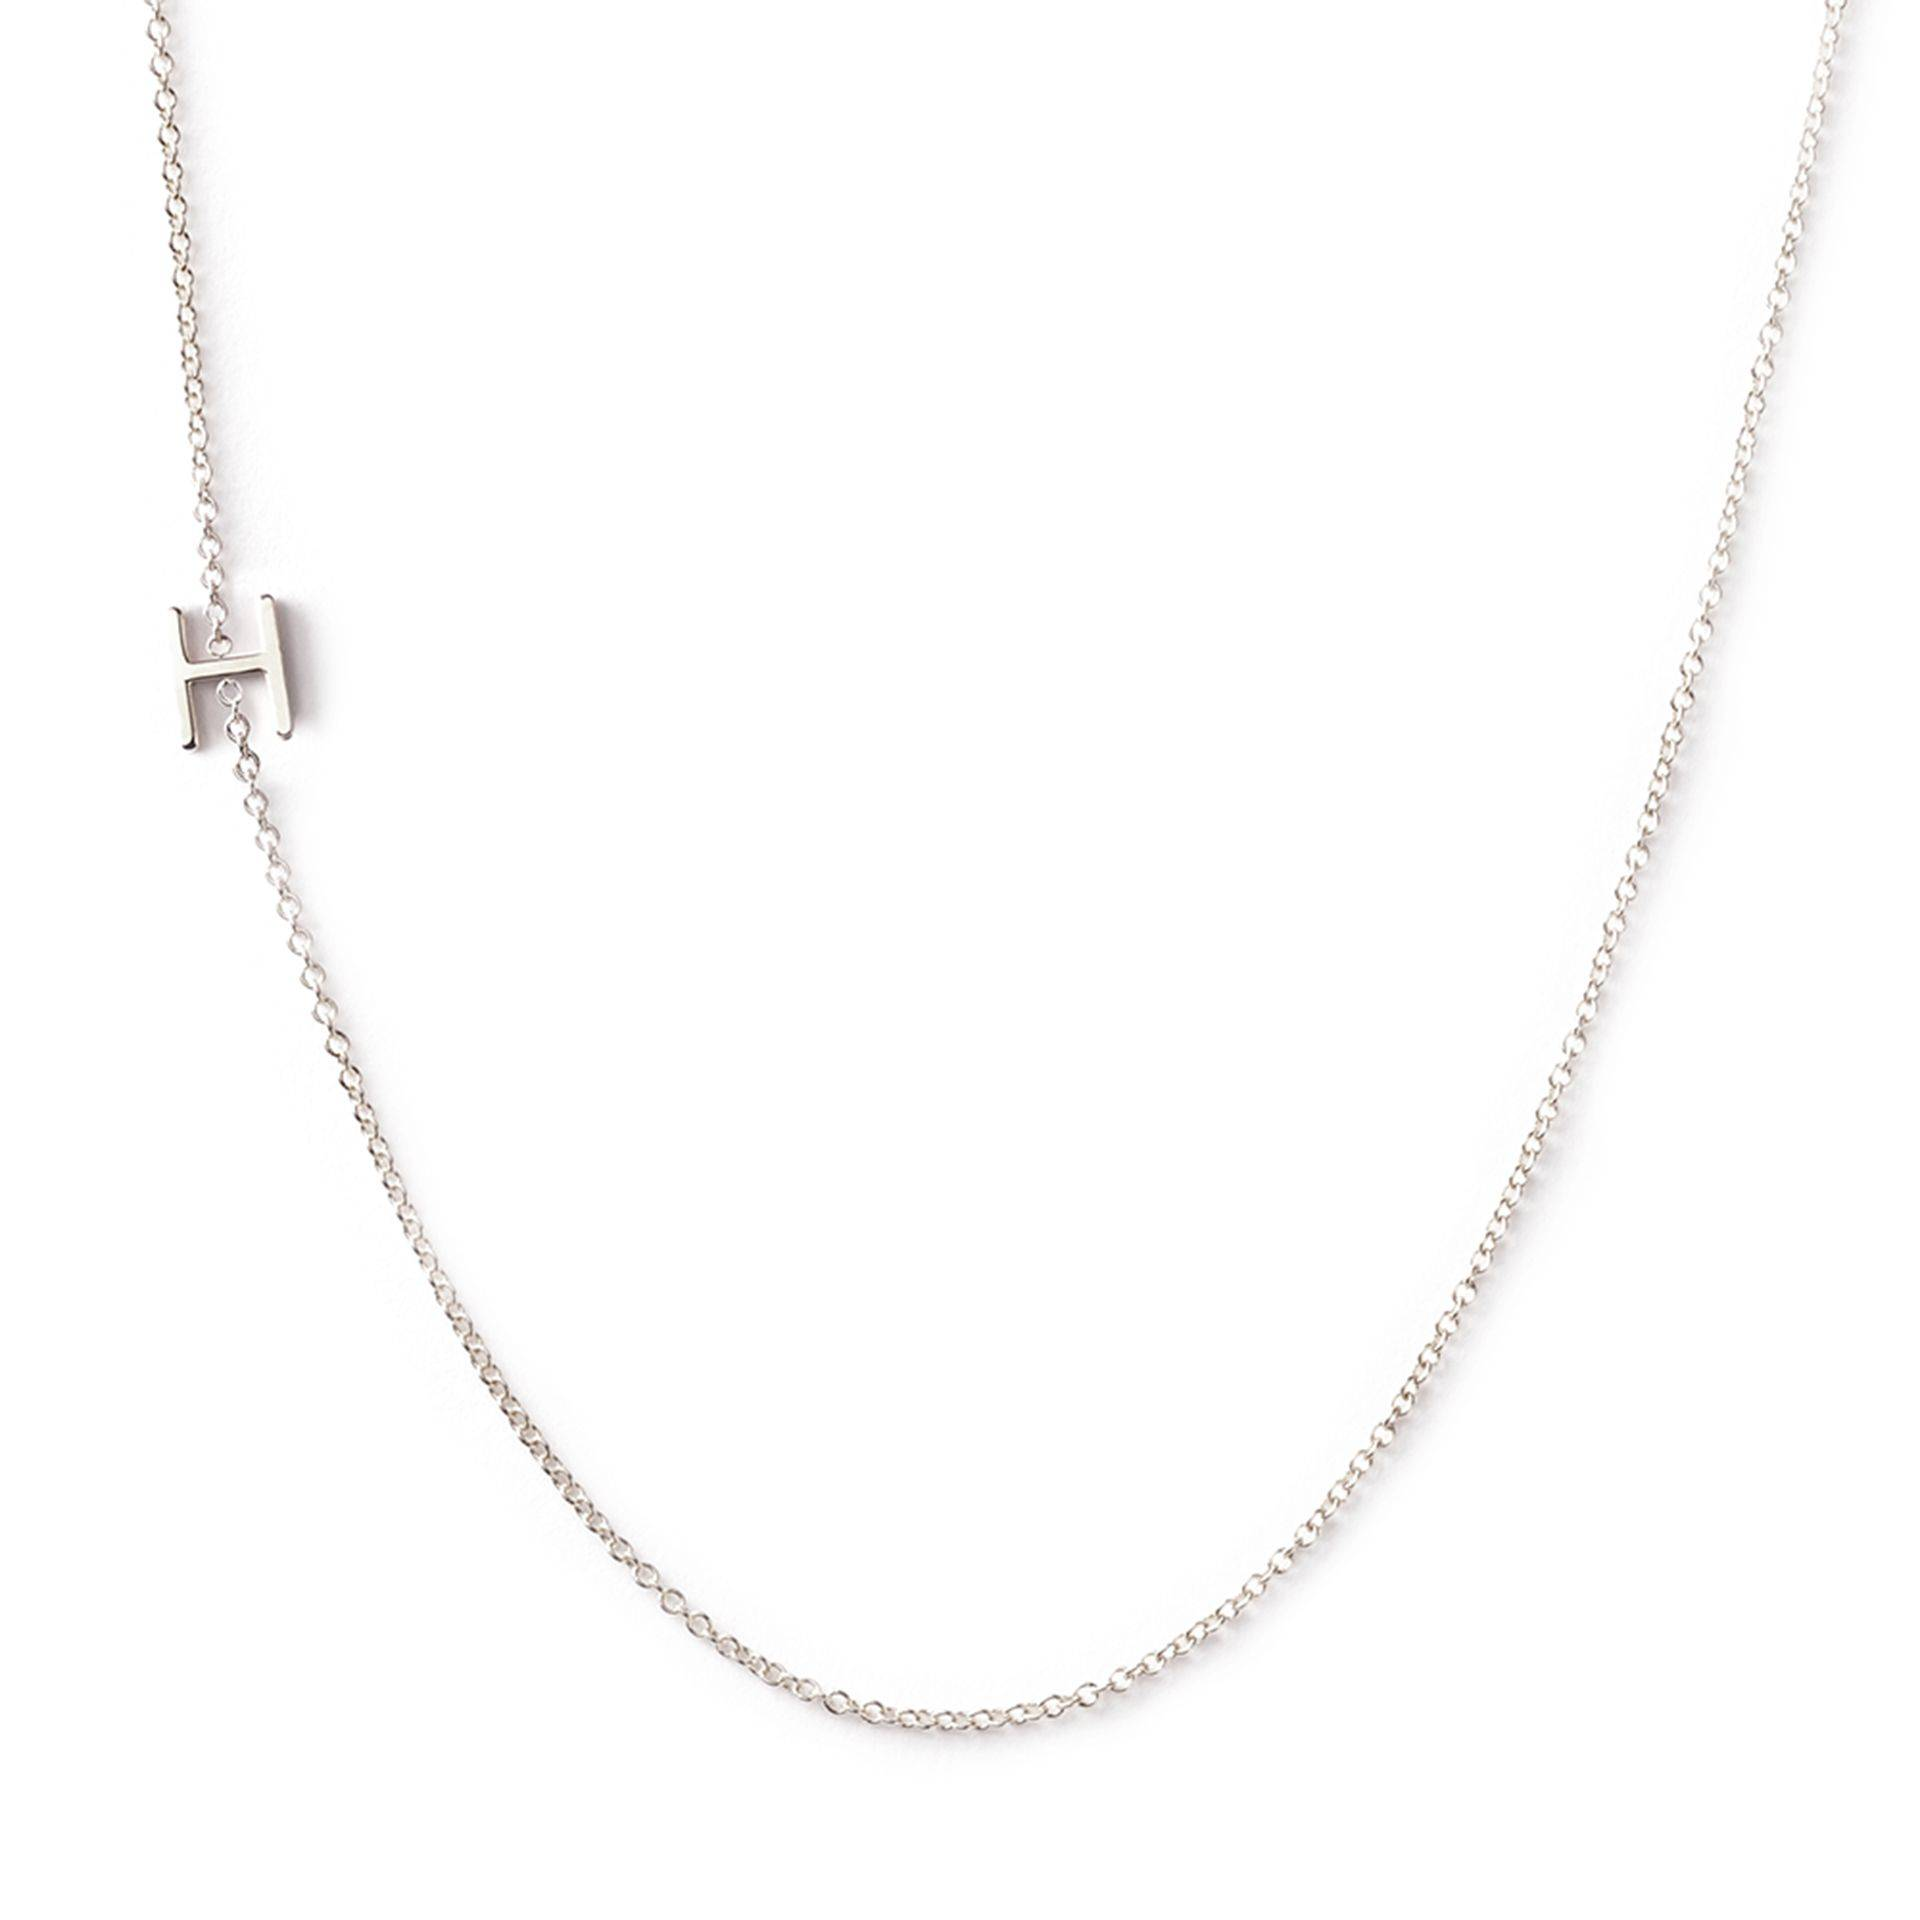 Meghan Markle Initial Necklace Maya Brenner